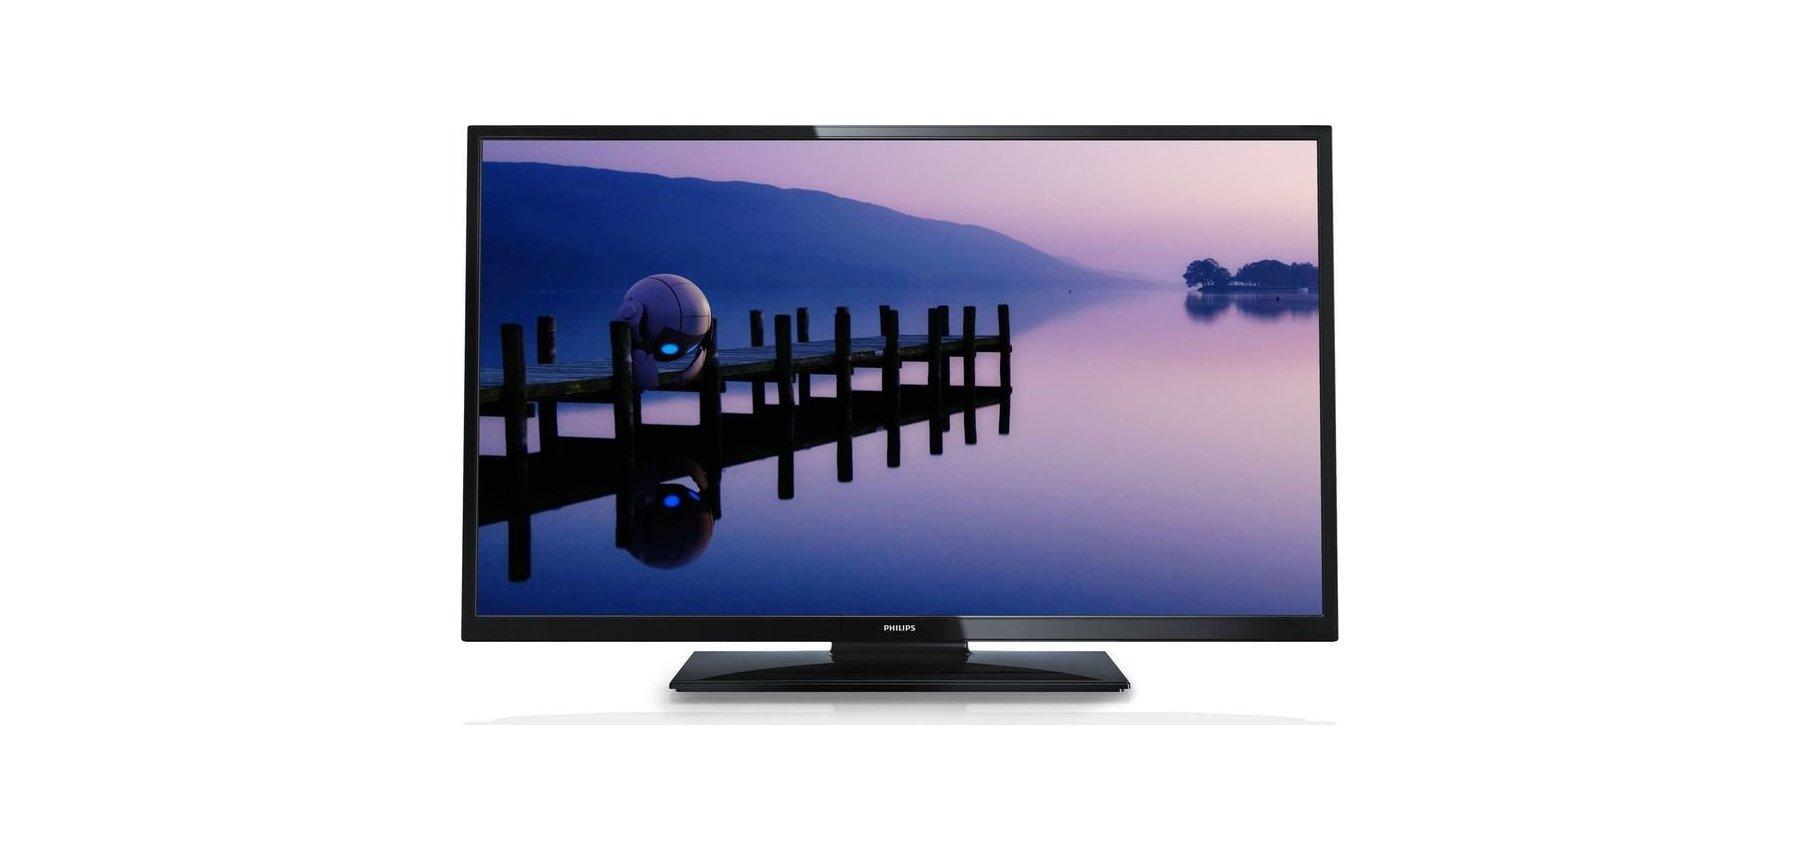 Telewizor PHILIPS 40PFL3008H/12/40Cali/SMART TV/Full HD 1920 x 1080